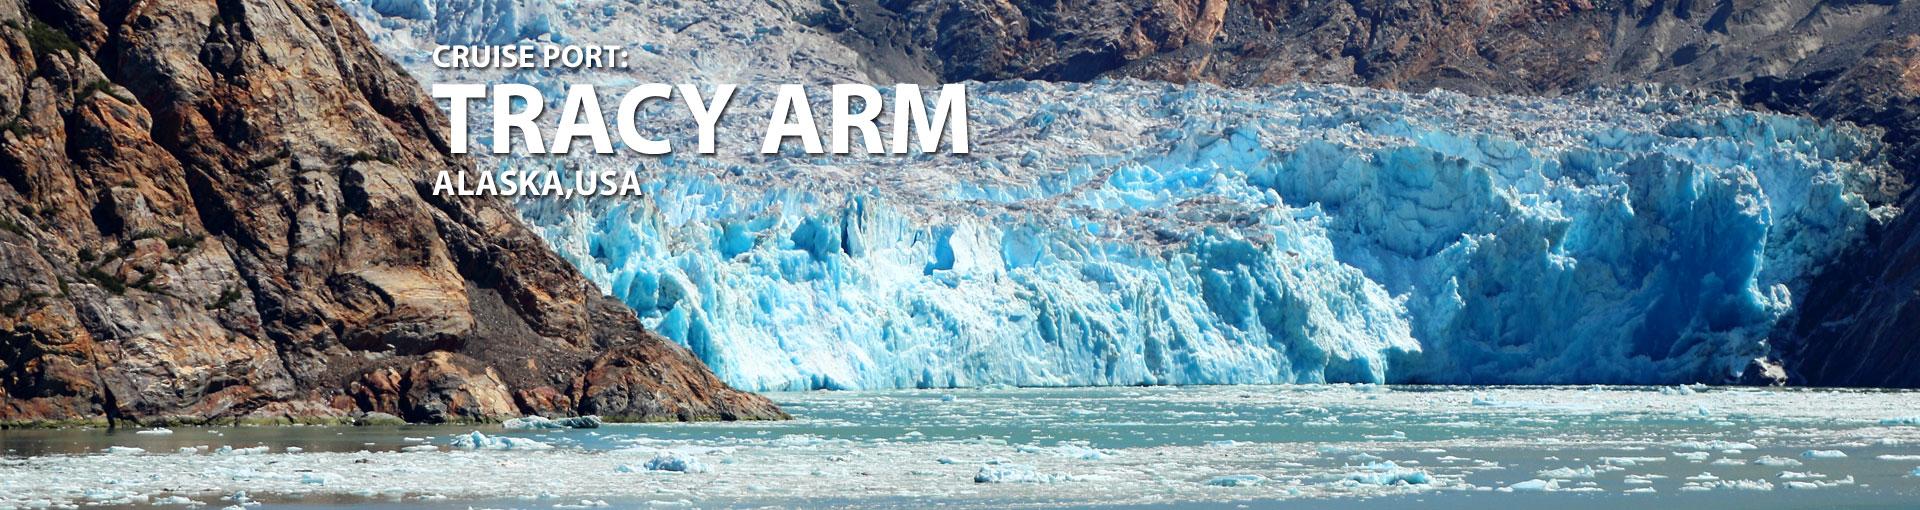 Cruises to Tracy Arm, Alaska